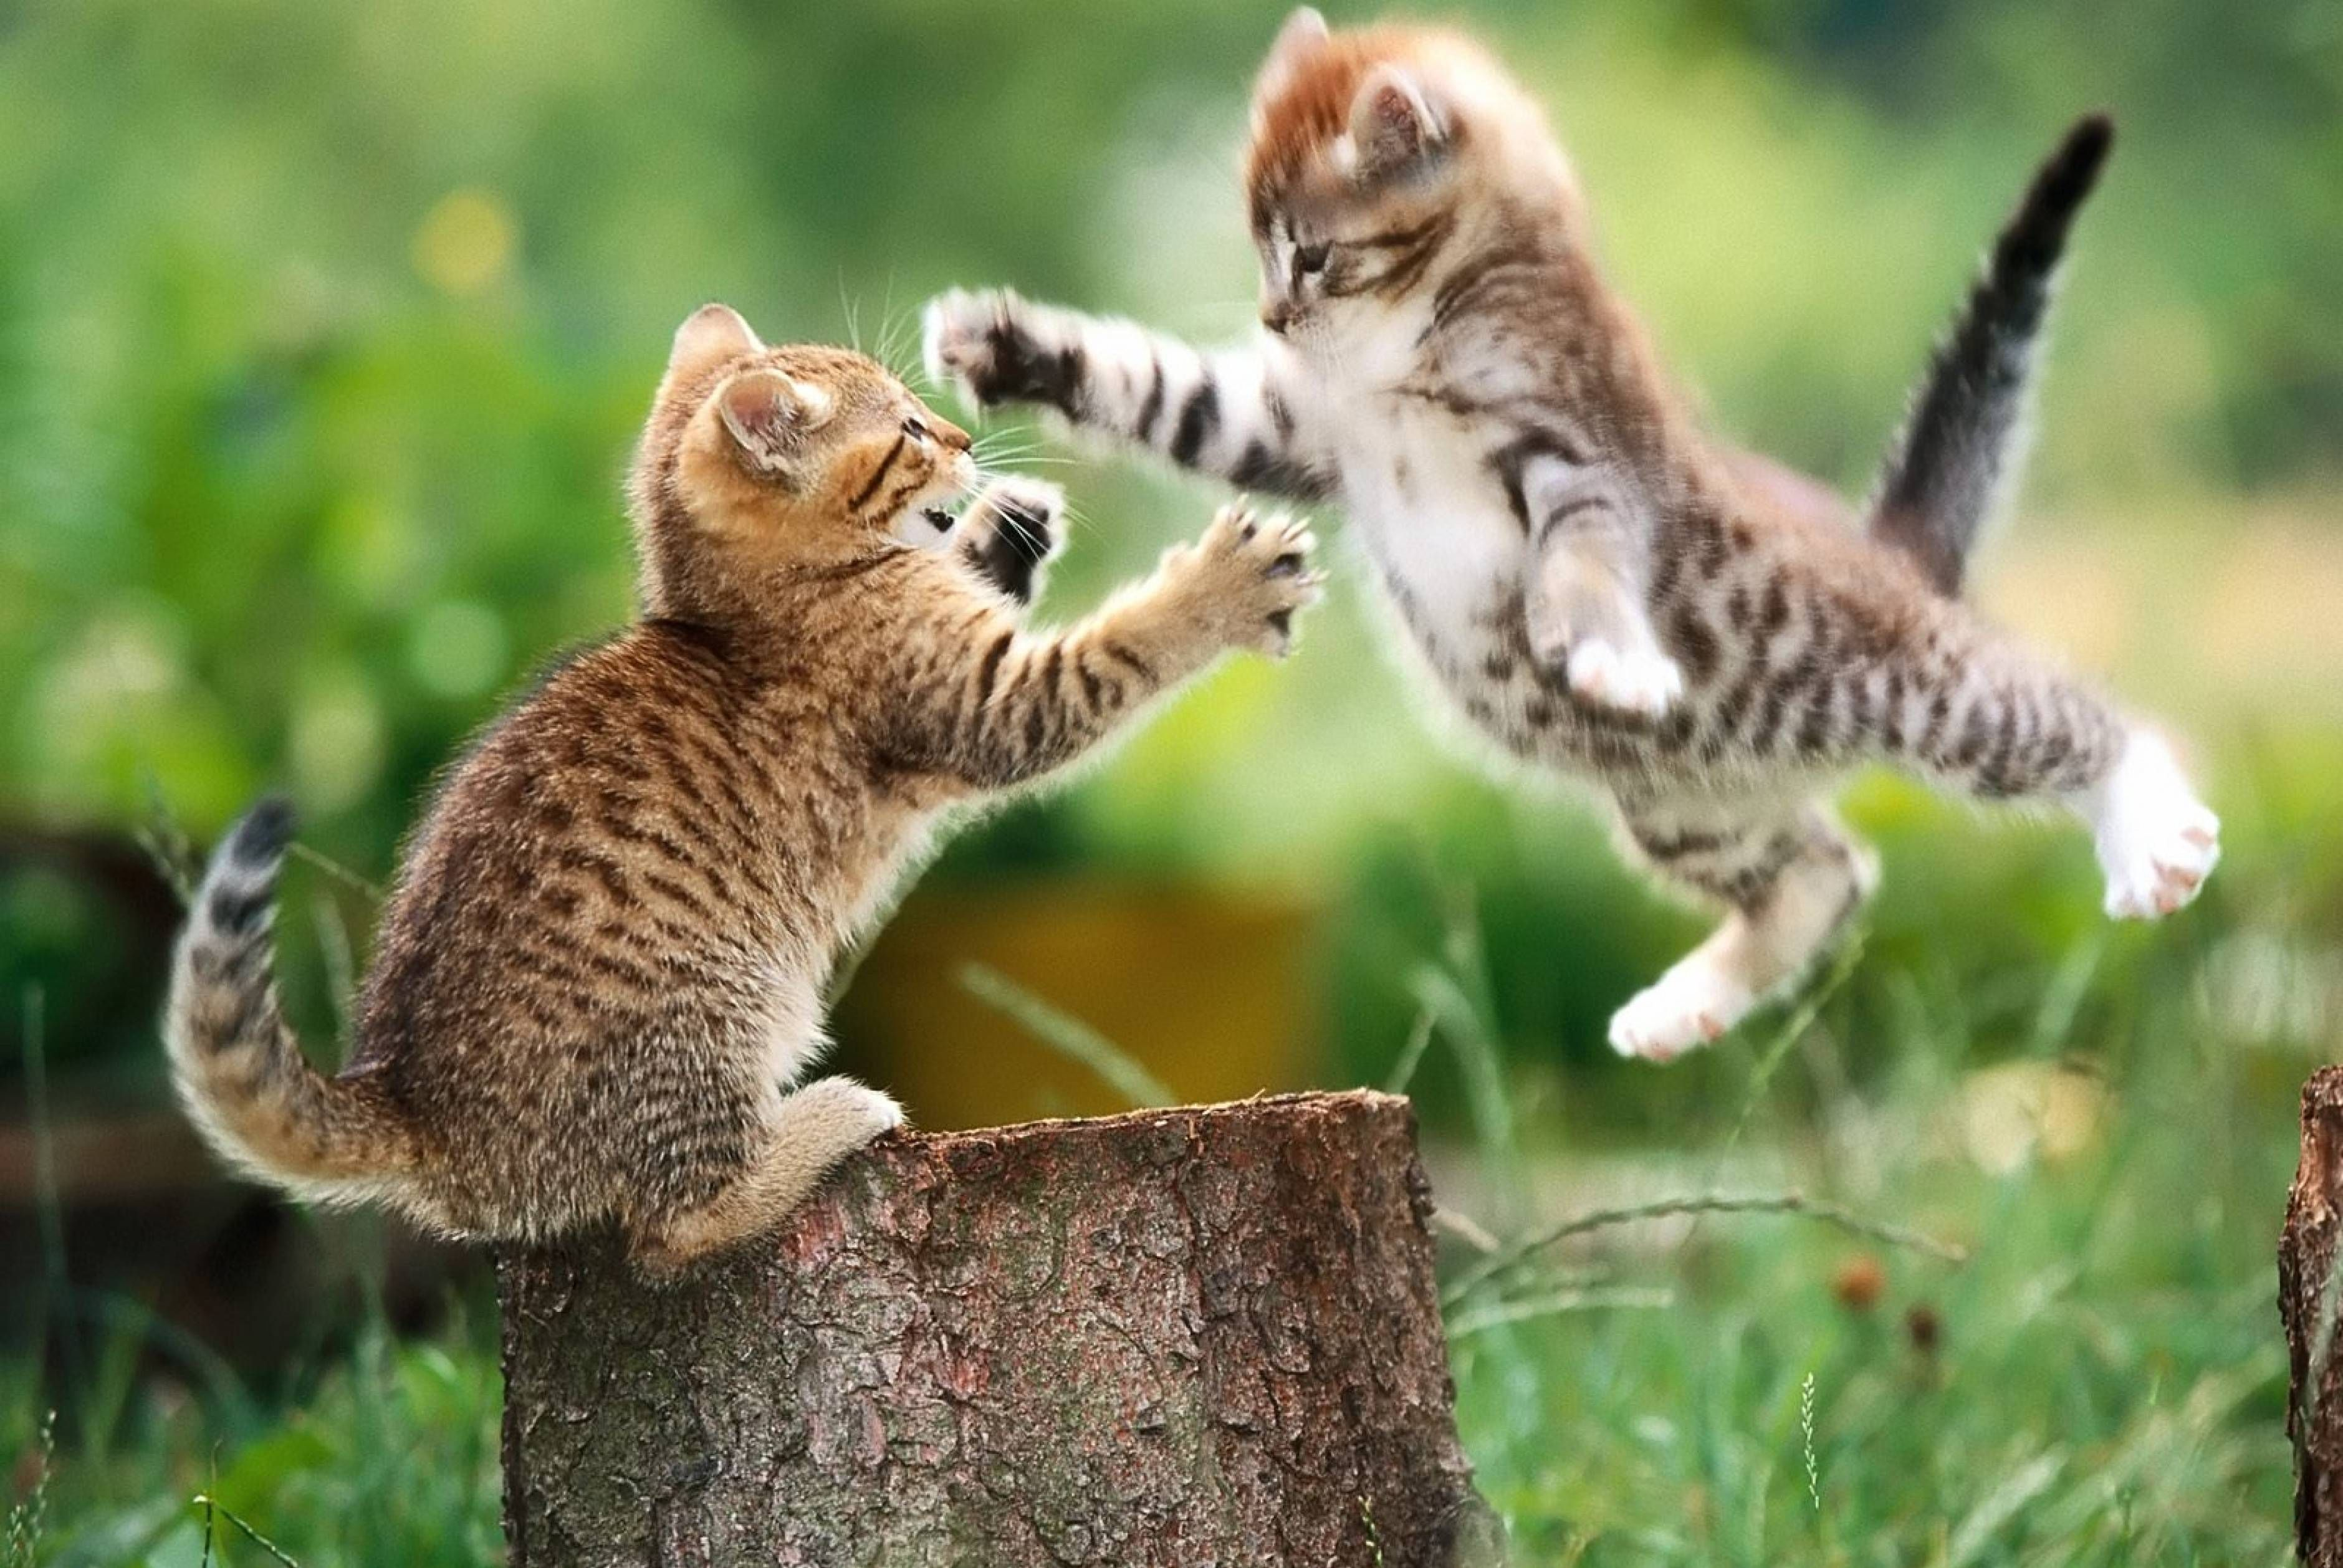 Cute Kittens Catsandkittensbreeds Cute Animal Pictures Kittens